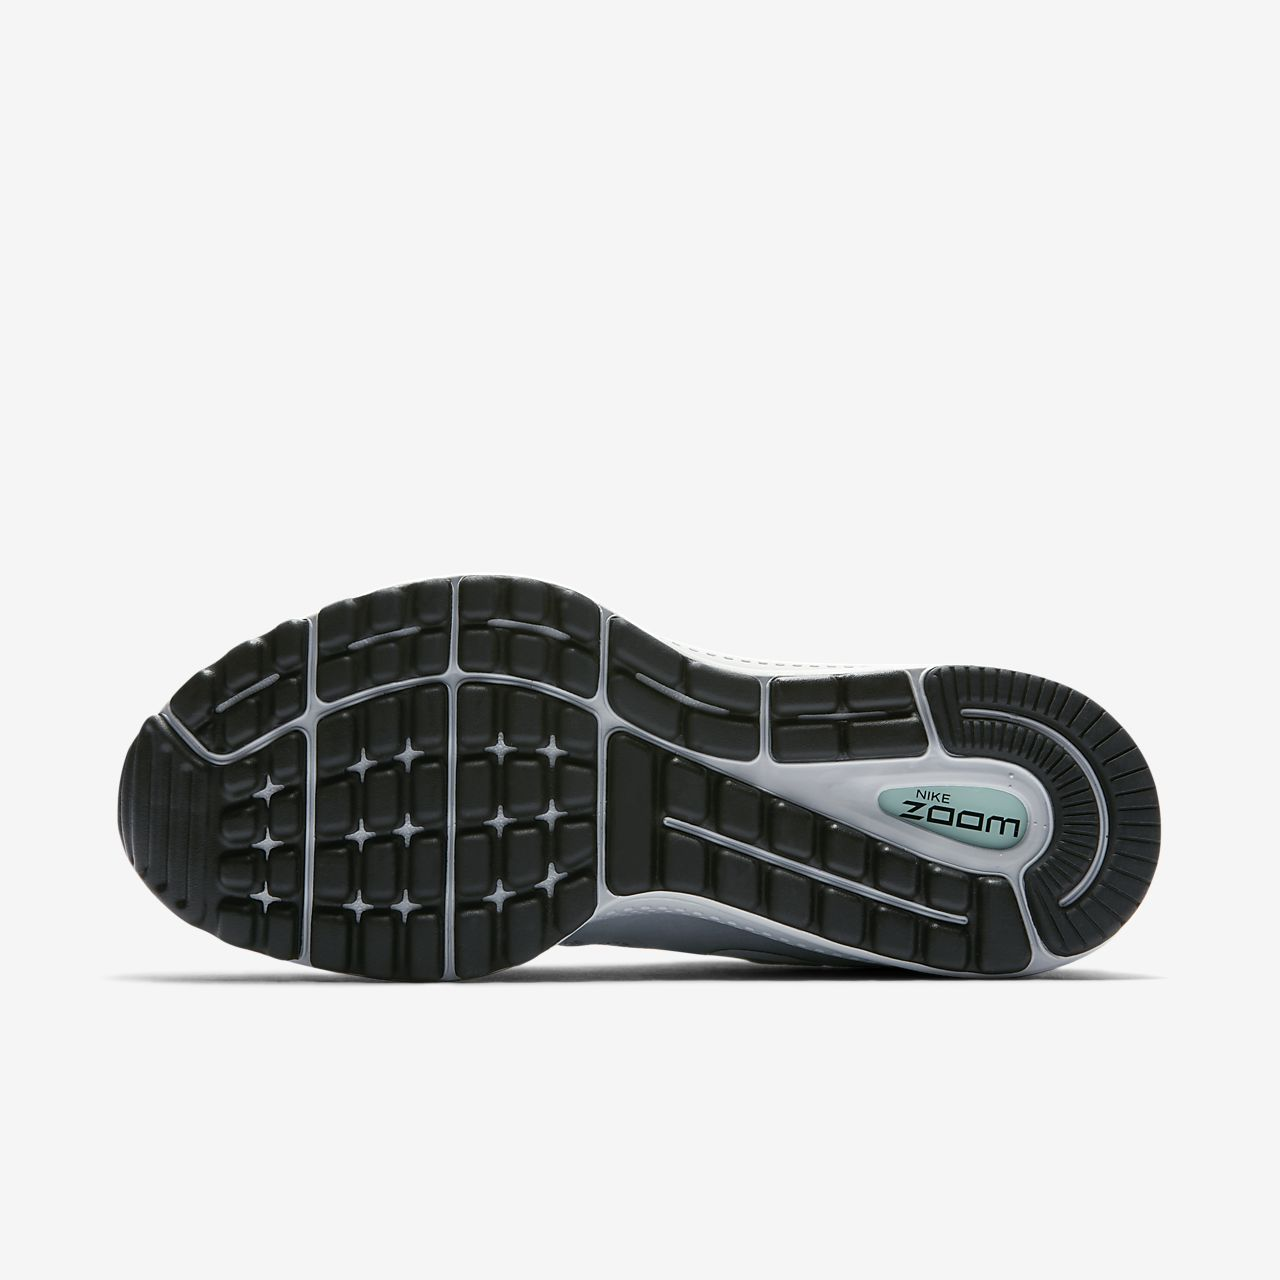 brand new baa4a 4294f ... Chaussure de running Nike Air Zoom Vomero 13 pour Femme